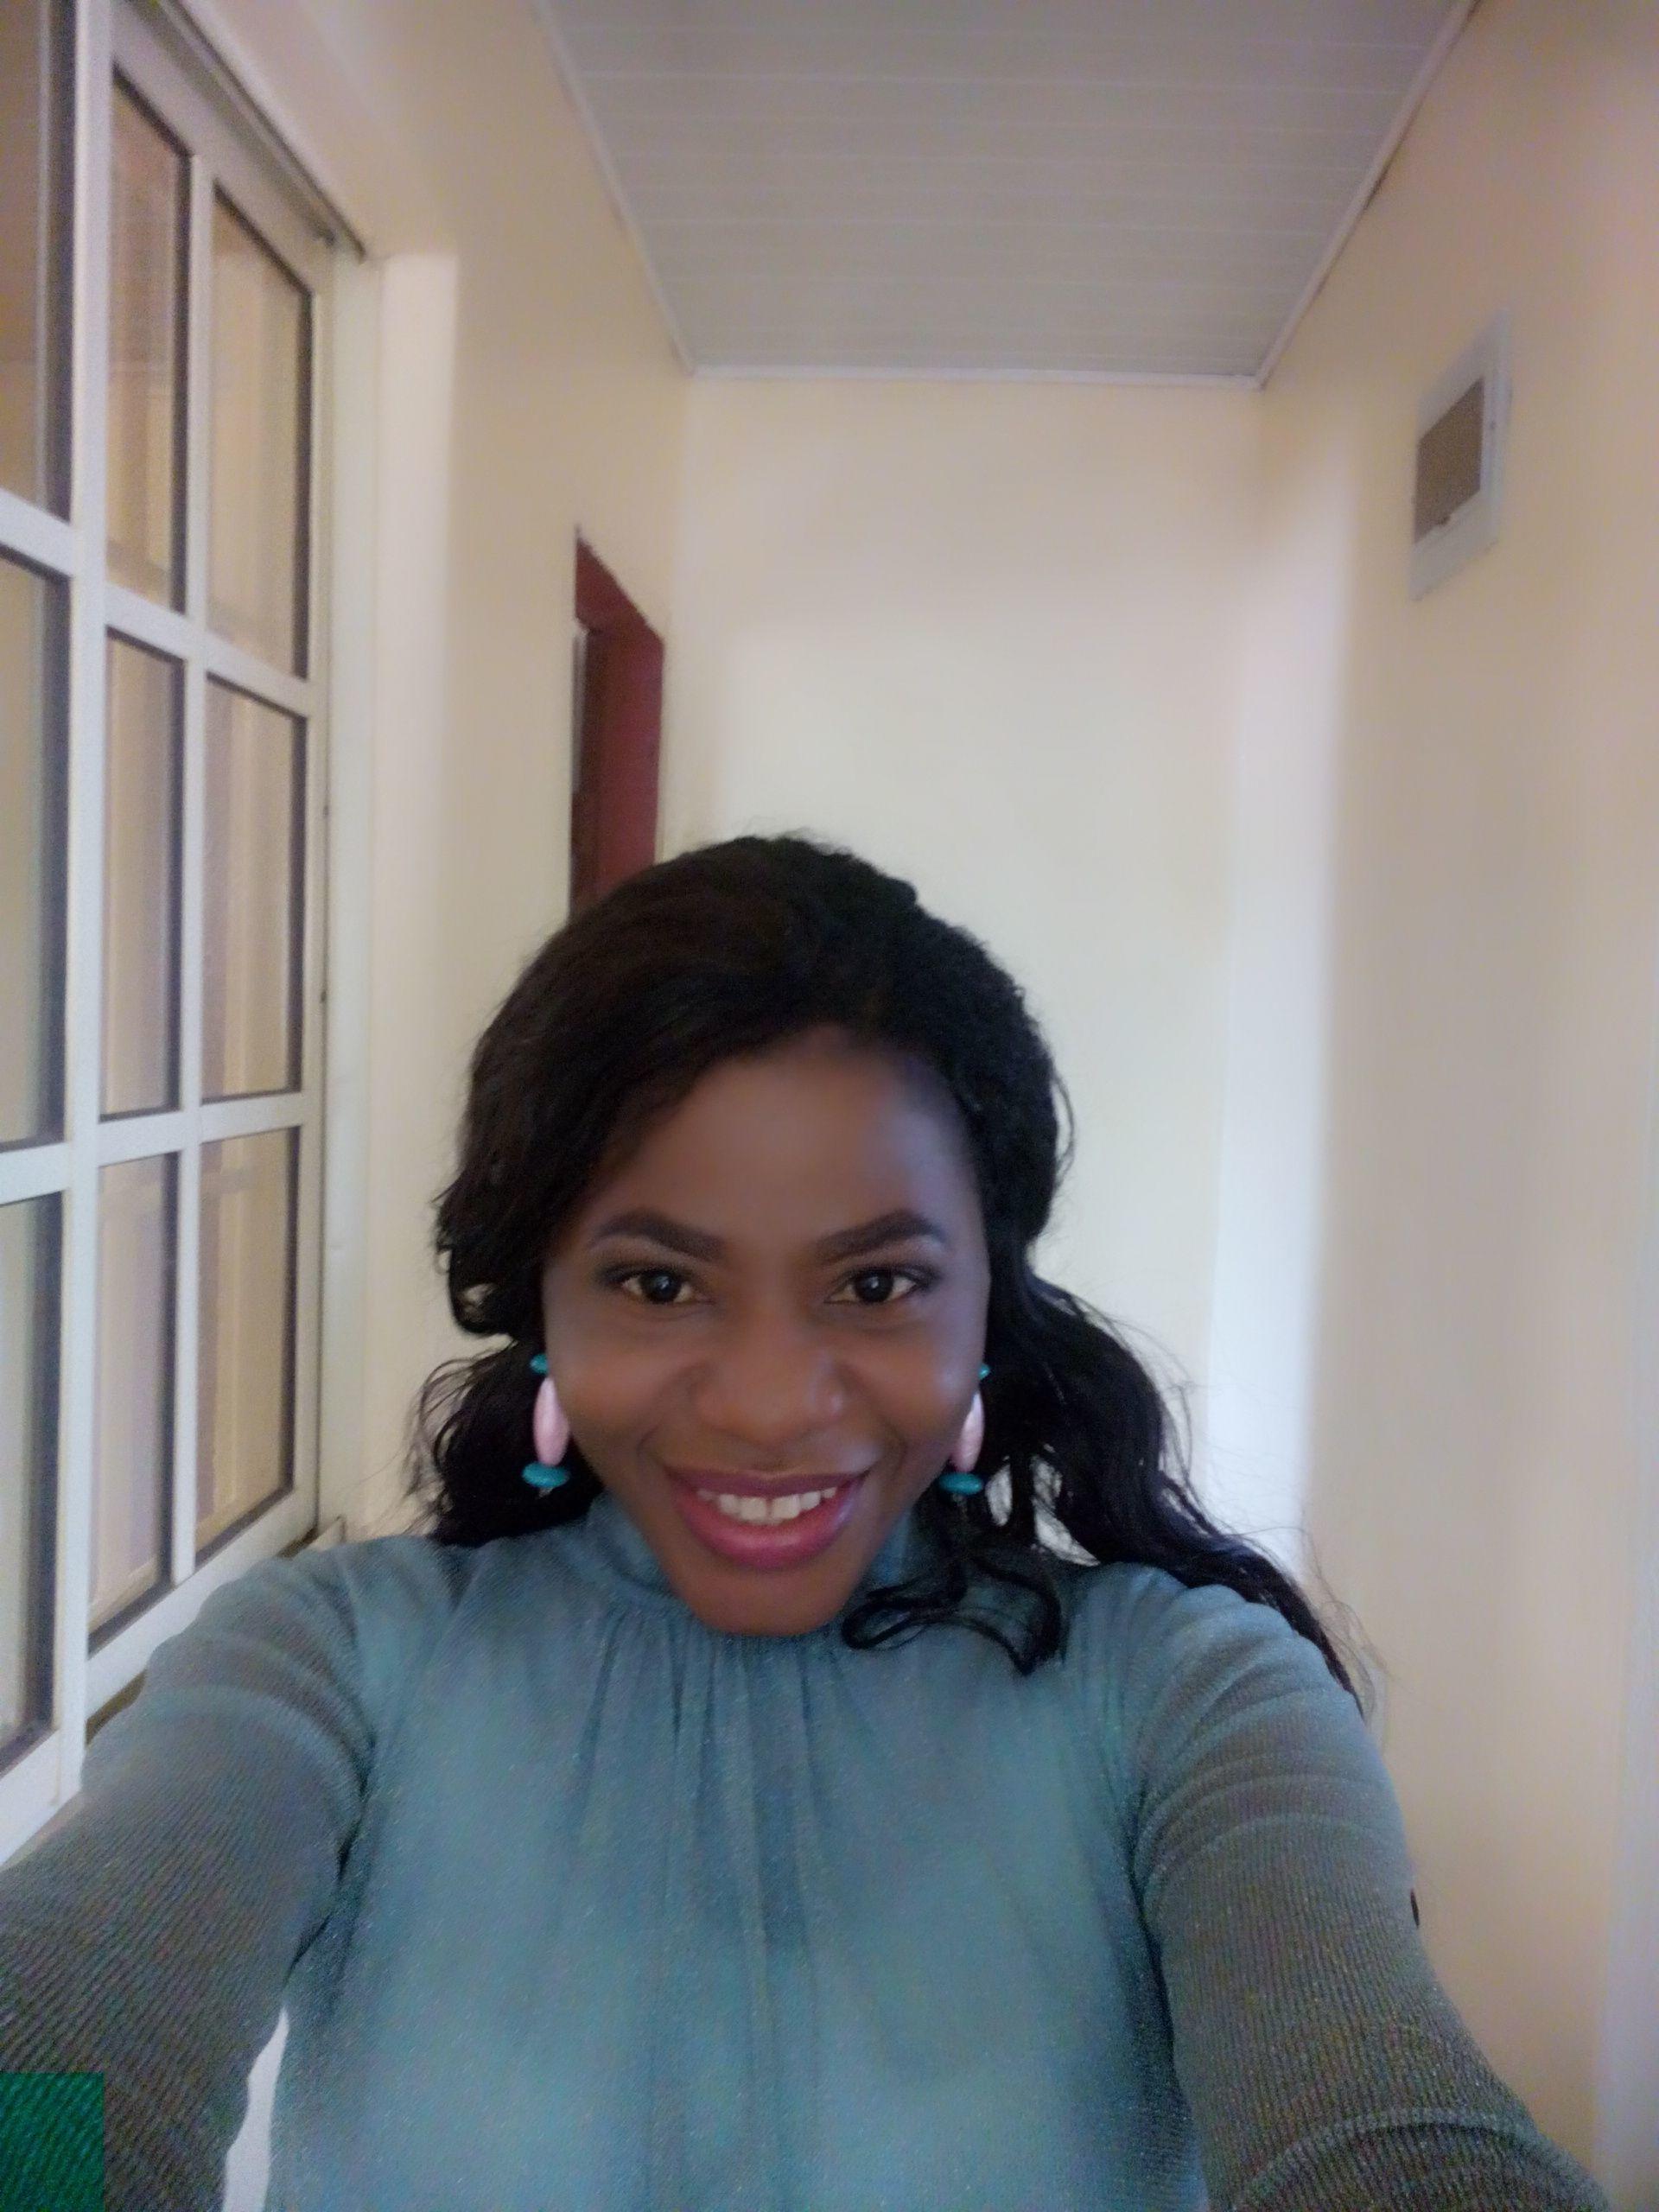 Romance Villa TOP 3 NIGERIAN DATING WEBSITES